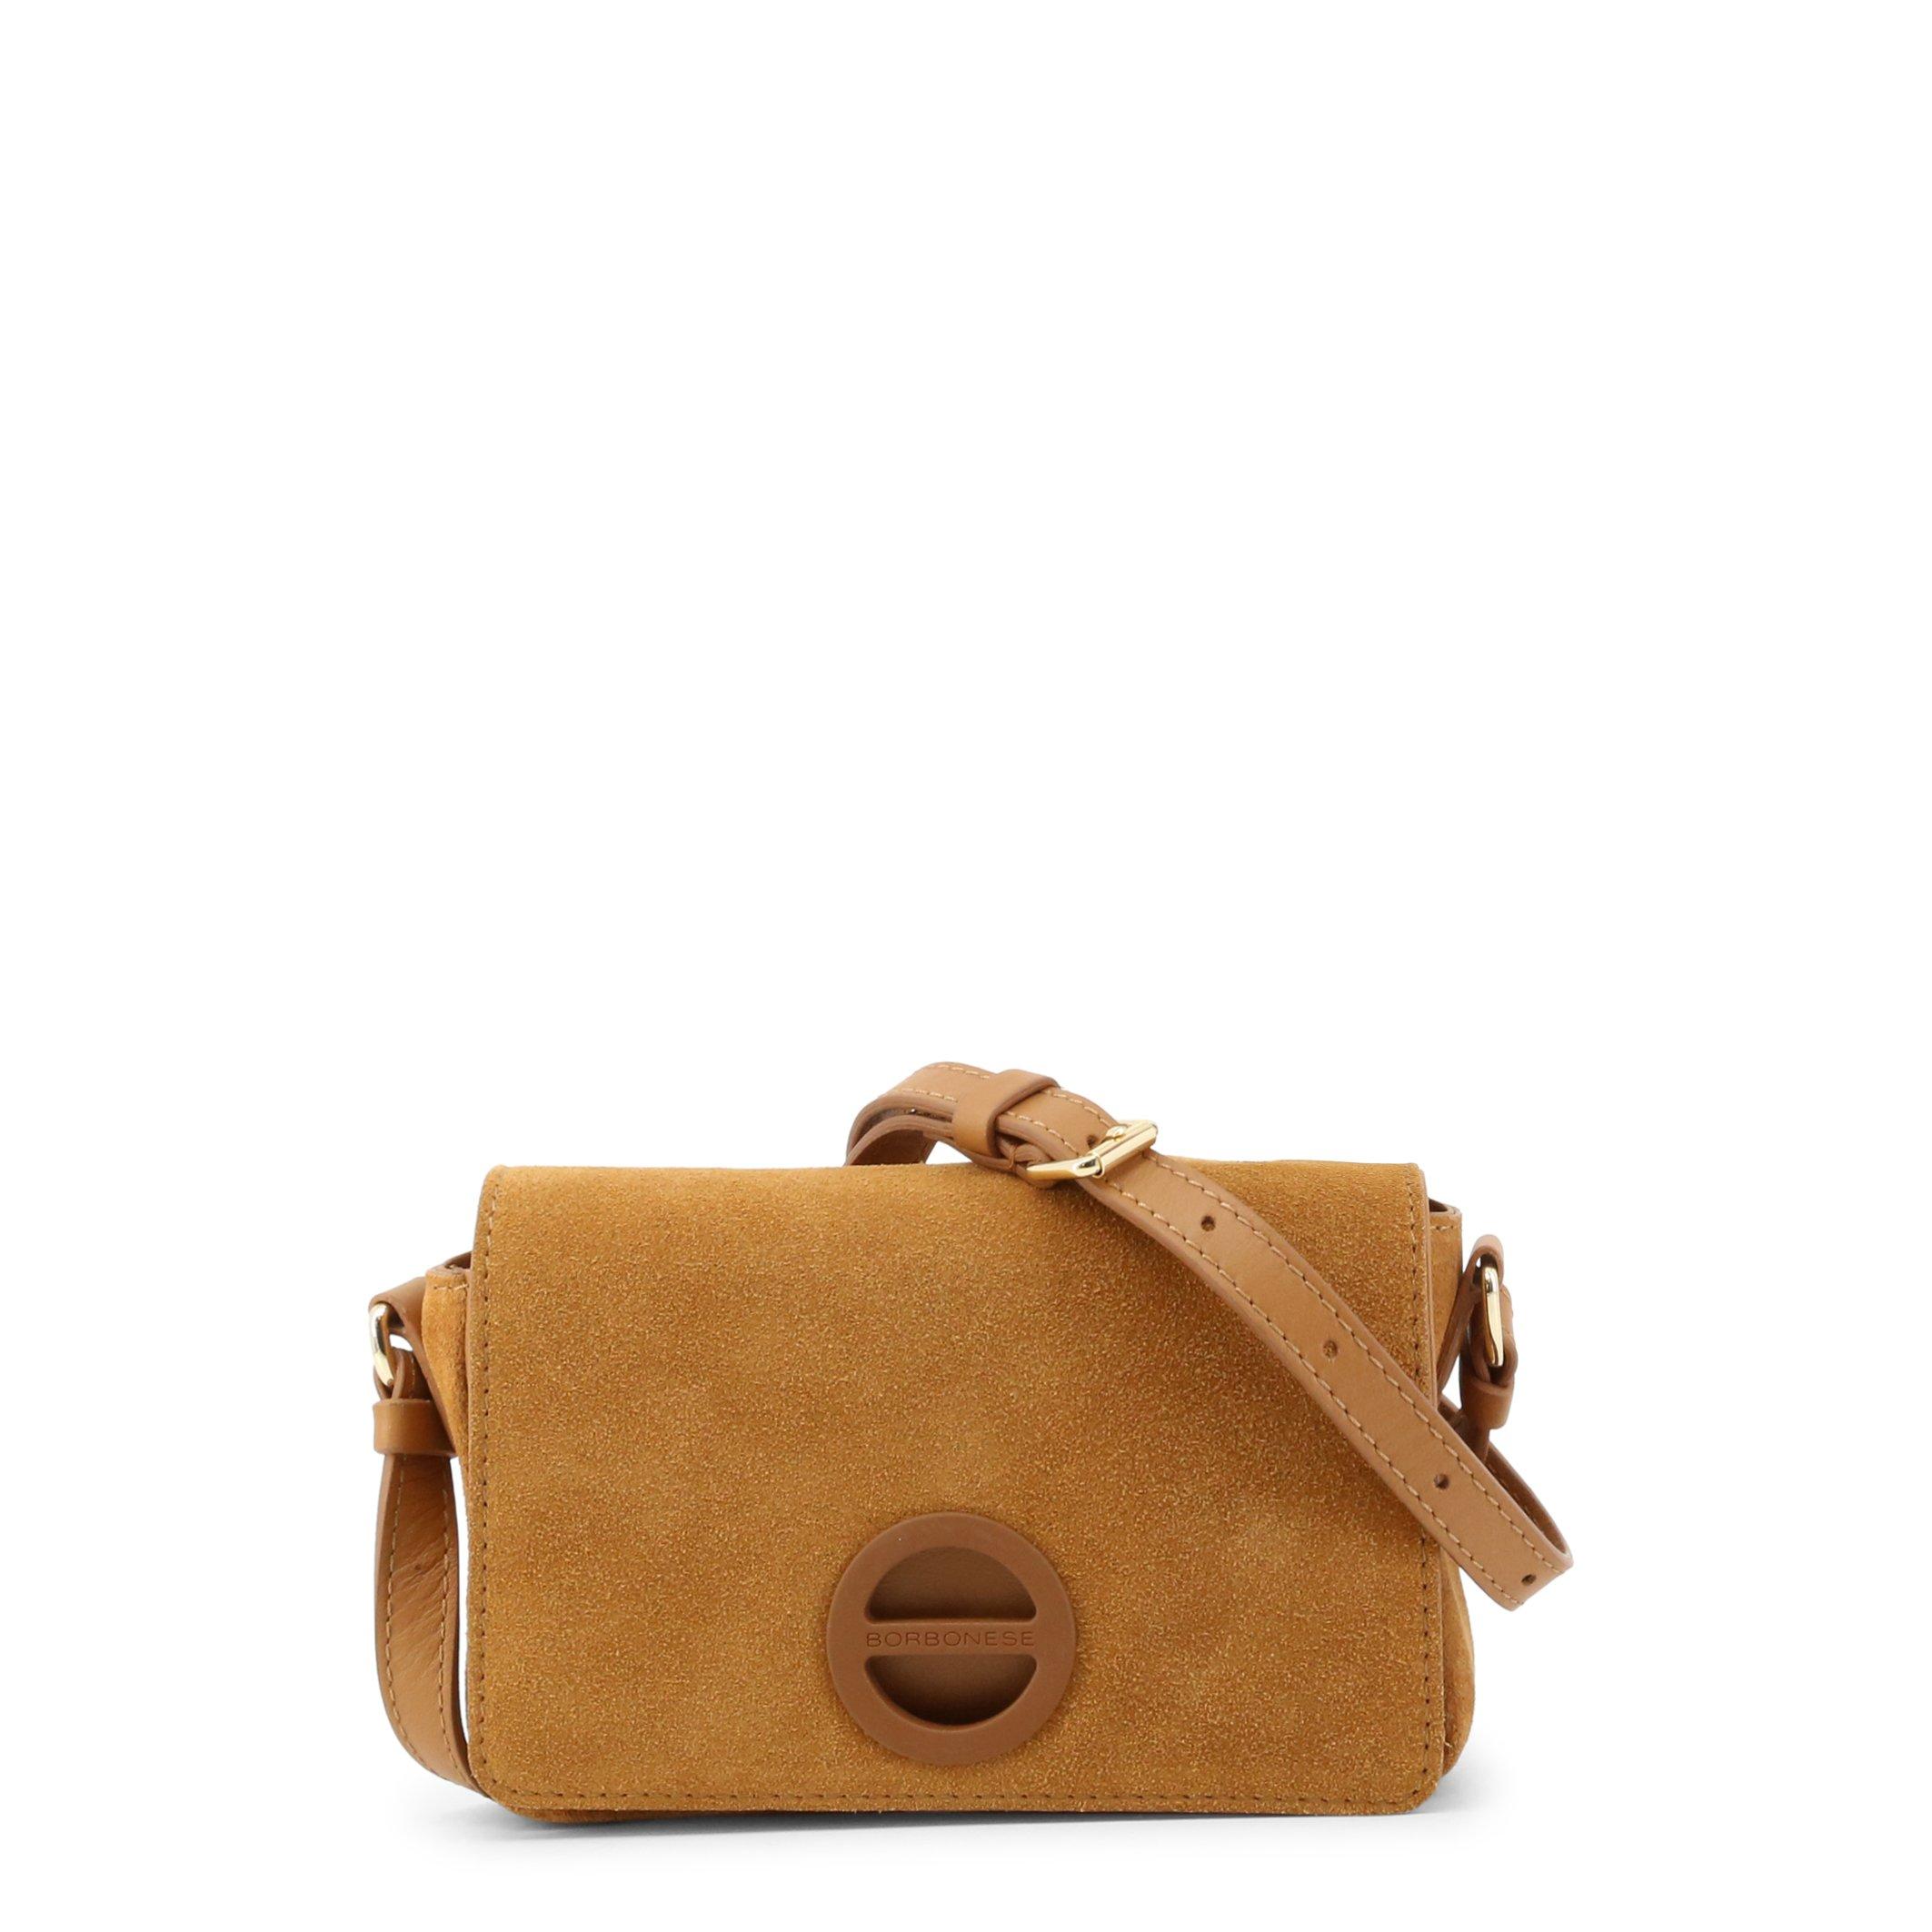 Borbonese Women's Crossbody Bag Various Colours 954816-J25 - brown NOSIZE